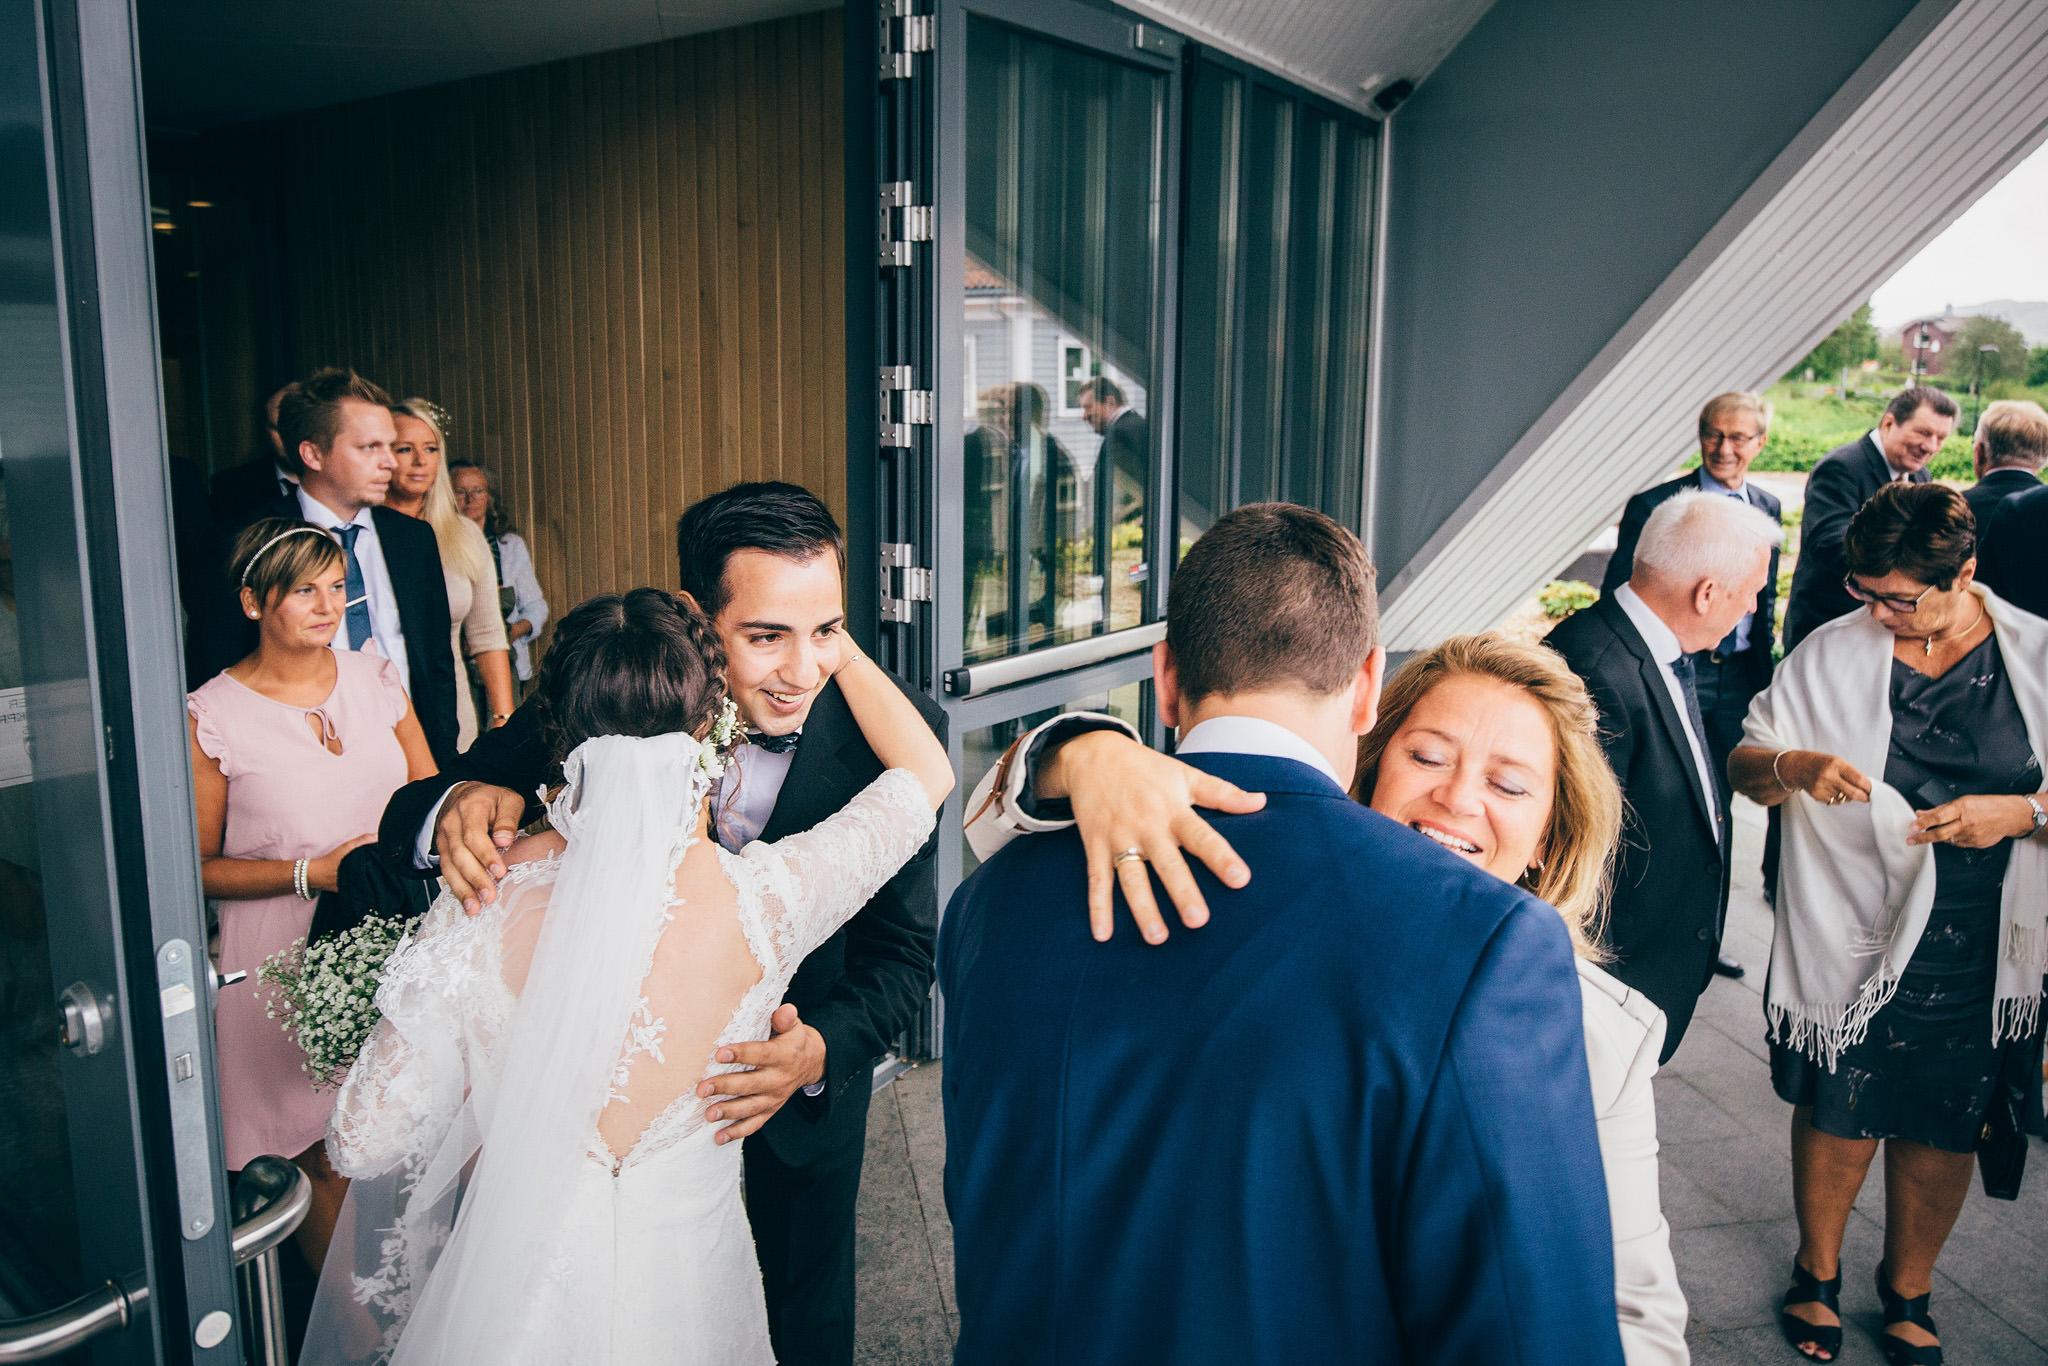 Norway+wedding+photographer+elopement+pre+wedding+Casey+Arneson-46.jpg